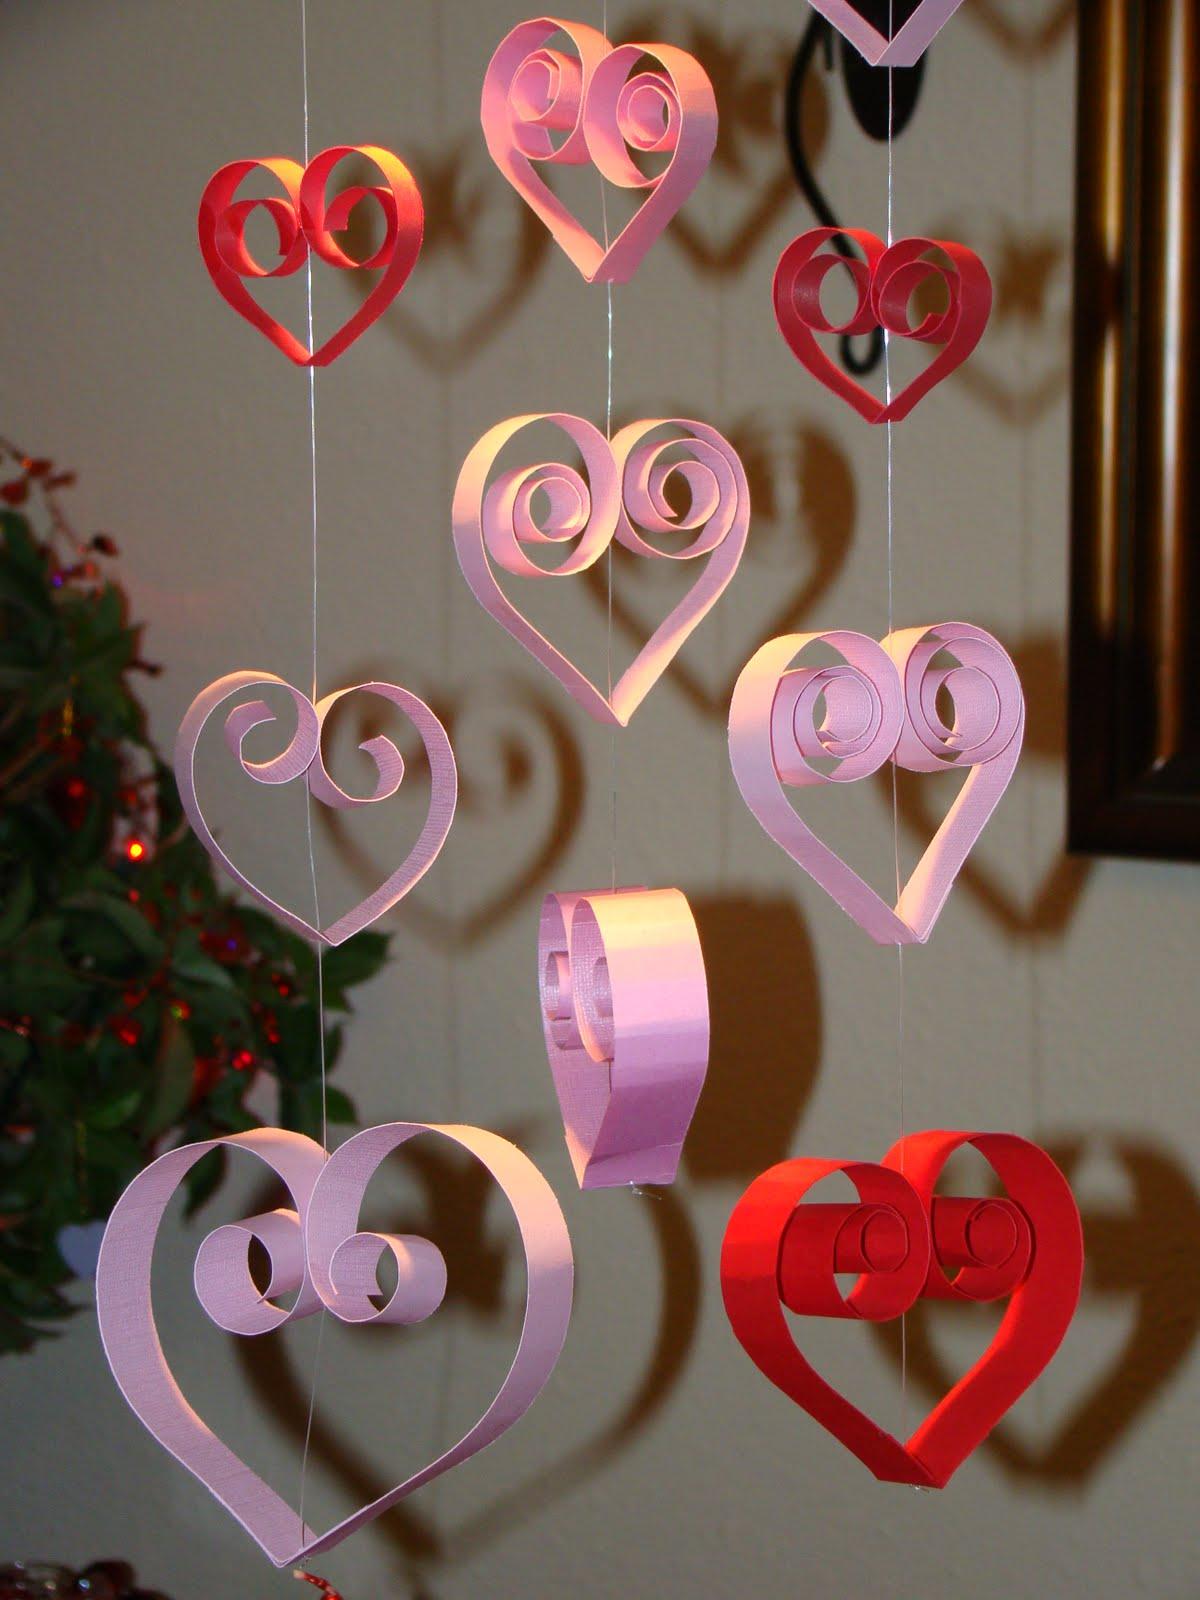 Affordable Kids Room Decorating Ideas Hgtv How To Make Handmade Decorative Items For Home Nicoh How